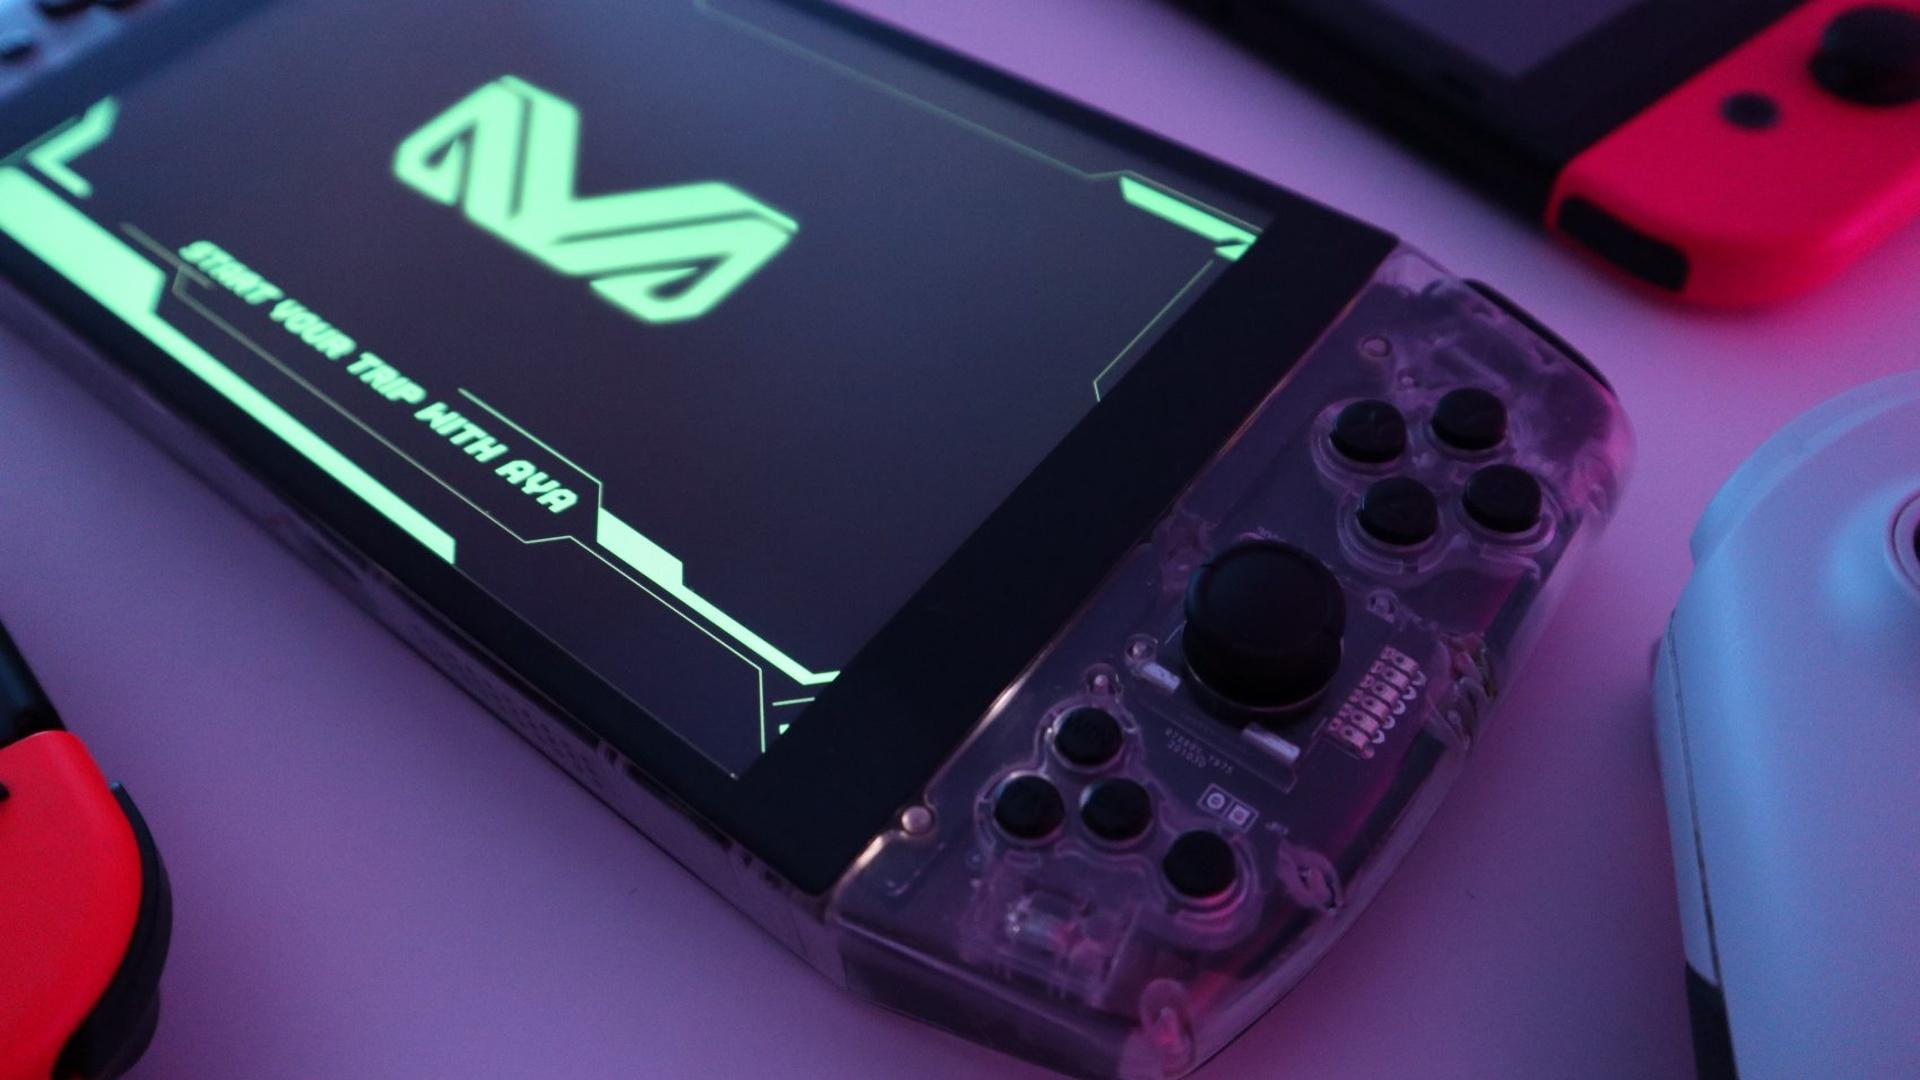 Neuer PC-Handheld kommt bald, packt Cyberpunk überrschend gut